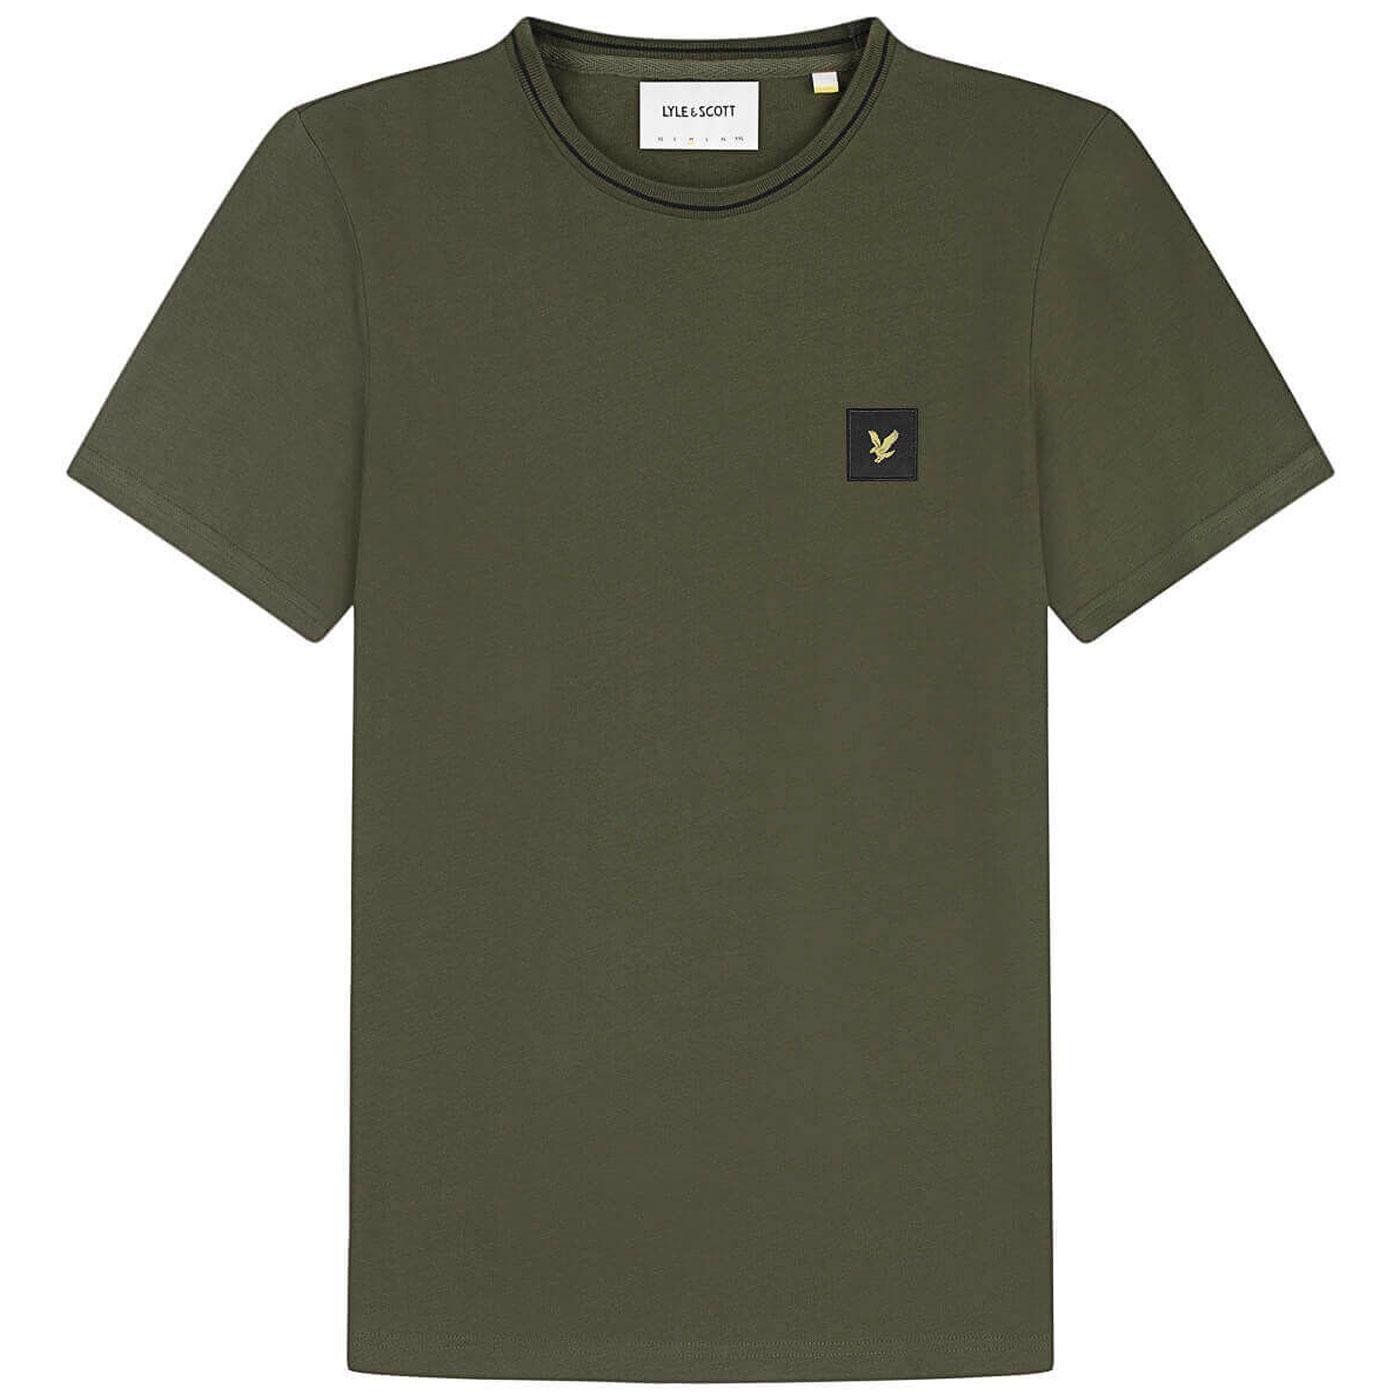 LYLE & SCOTT Mod Casuals Retro Tipped T-Shirt G